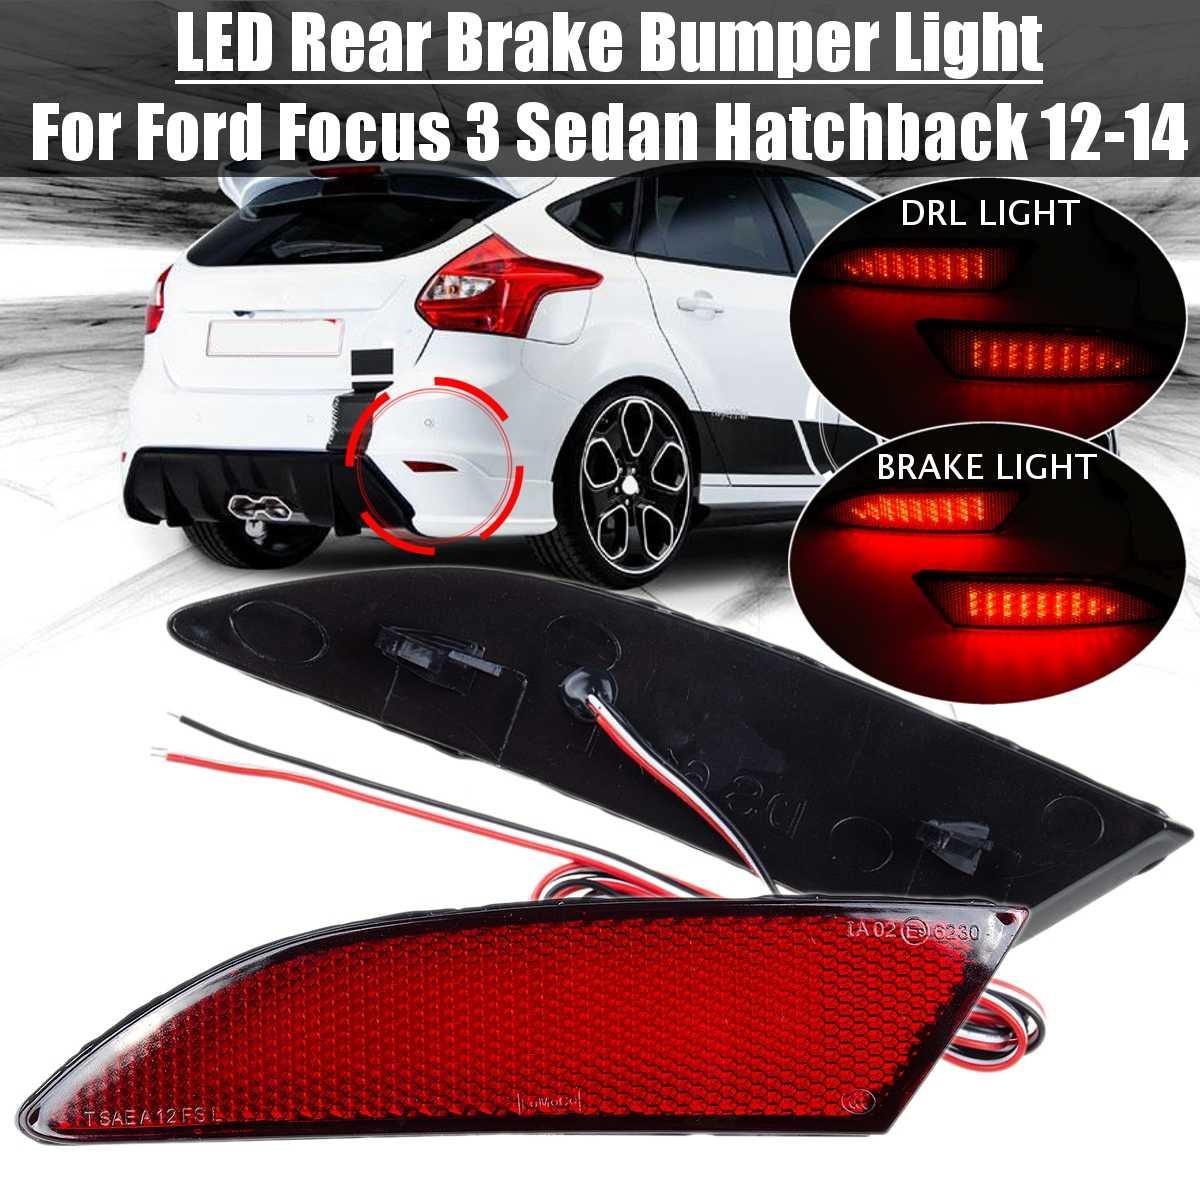 2x Car Rear Reflector Light for Ford Focus 3 MK3 2012 2013 2014 Sedan Hatchback Car Rear Bumper Brake And Driviing Warn Lamp